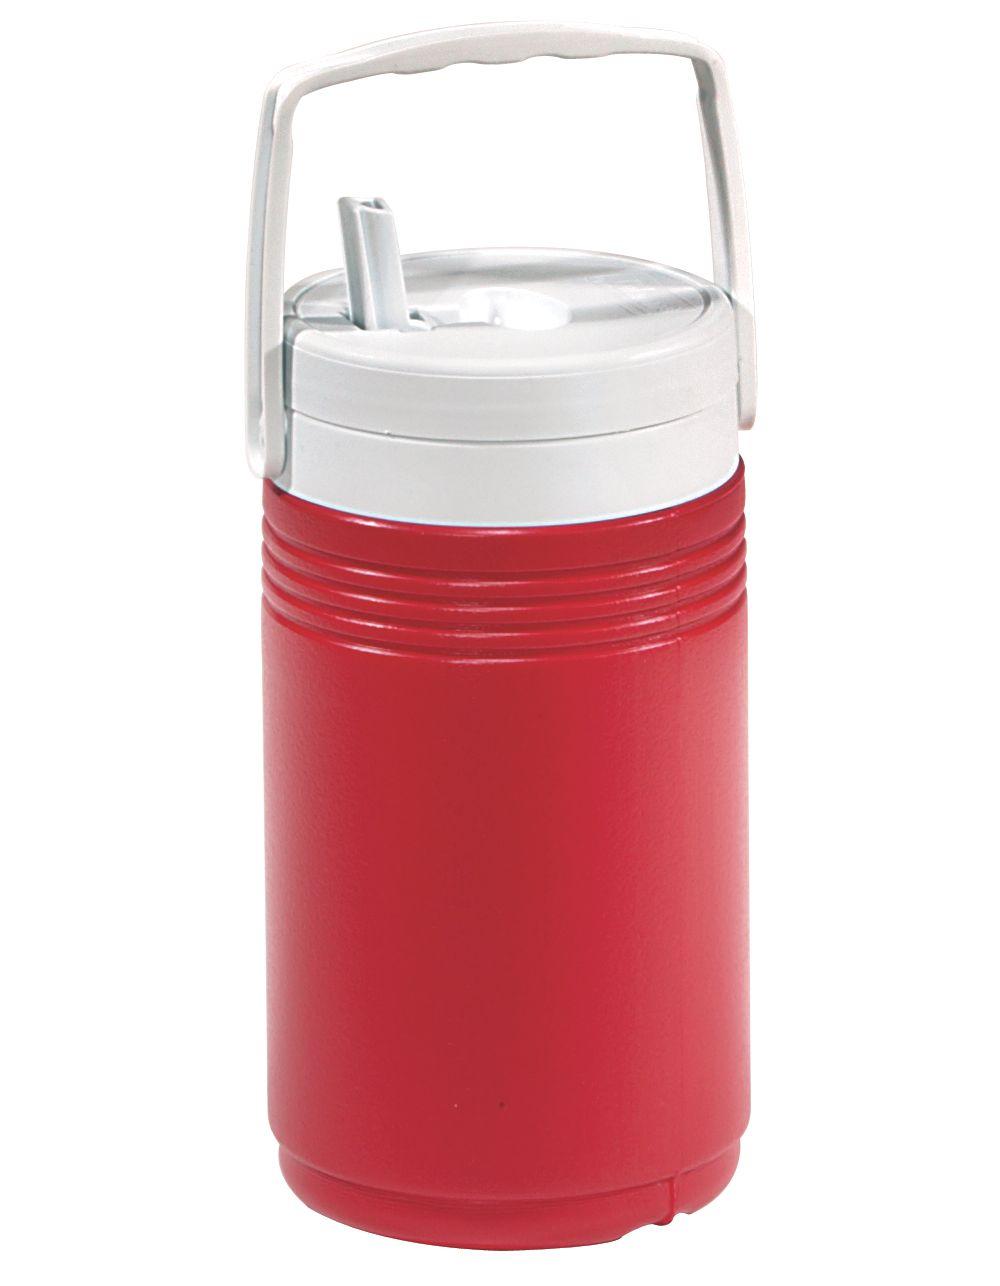 1/2 Gallon Beverage Jug - Red